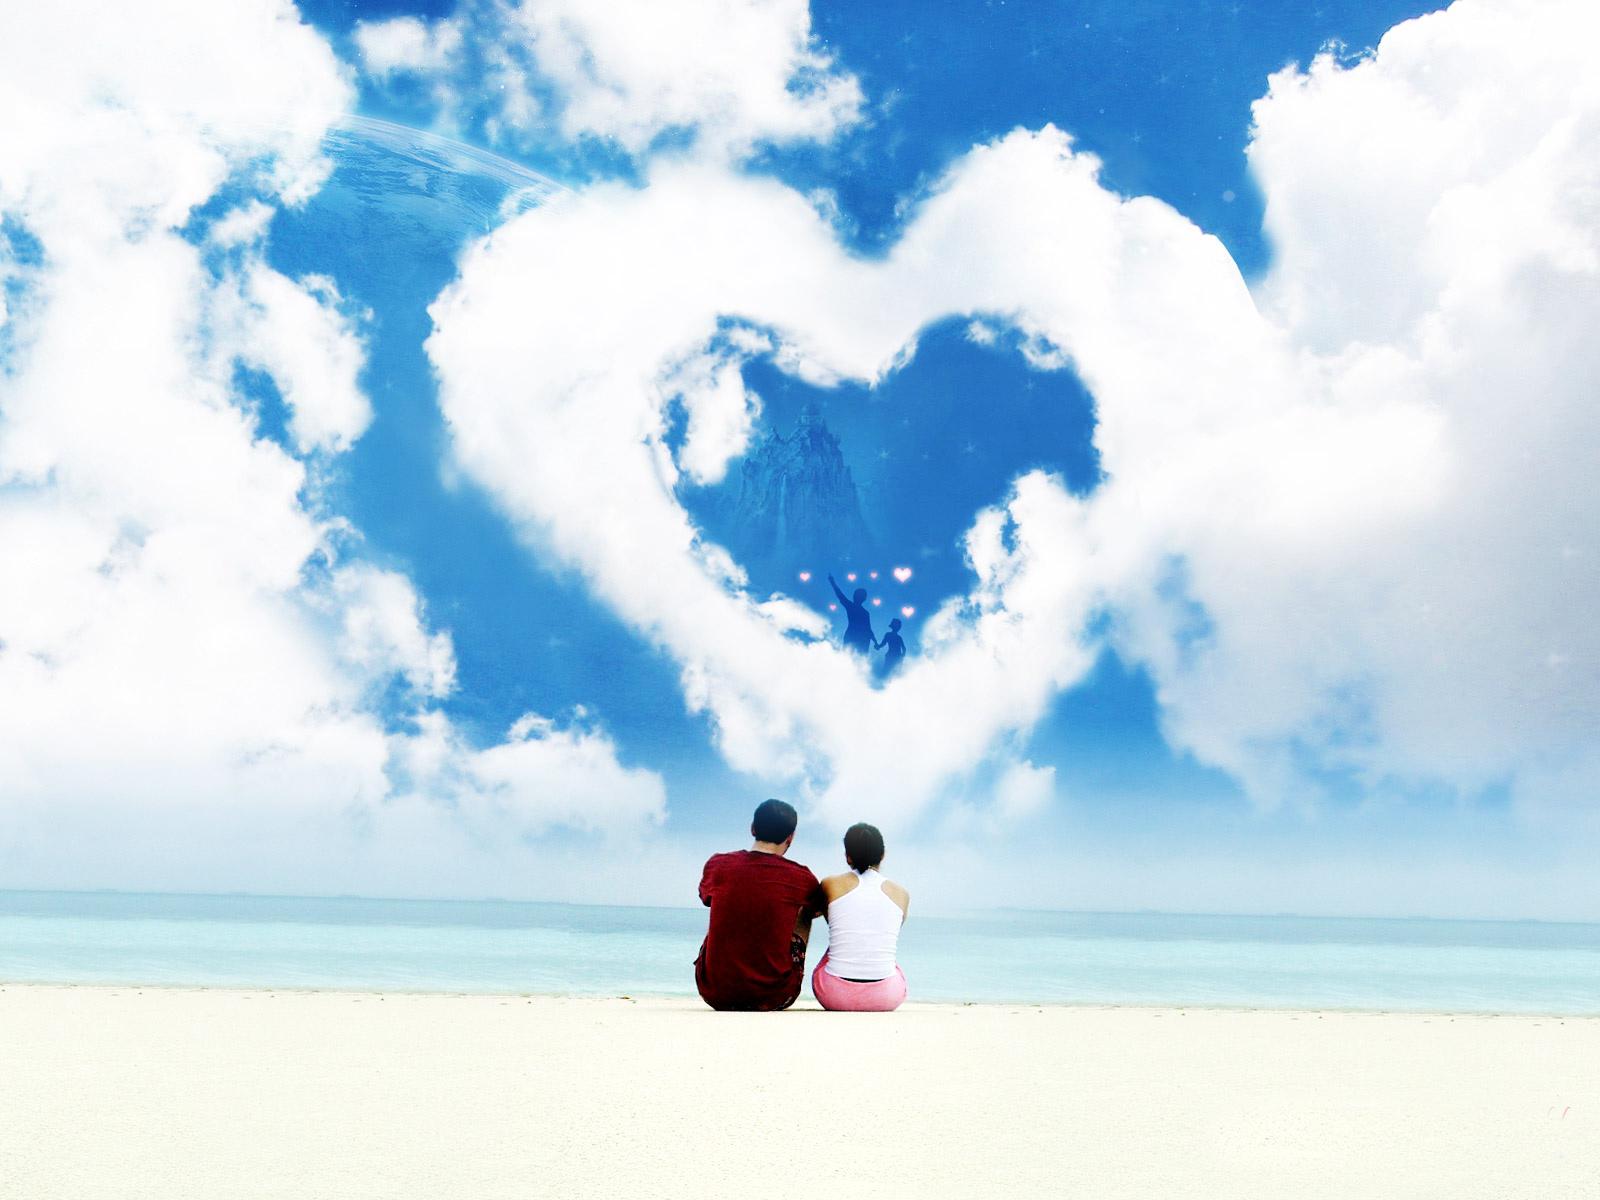 Galaxy Nexus 7 Wallpaper: Love